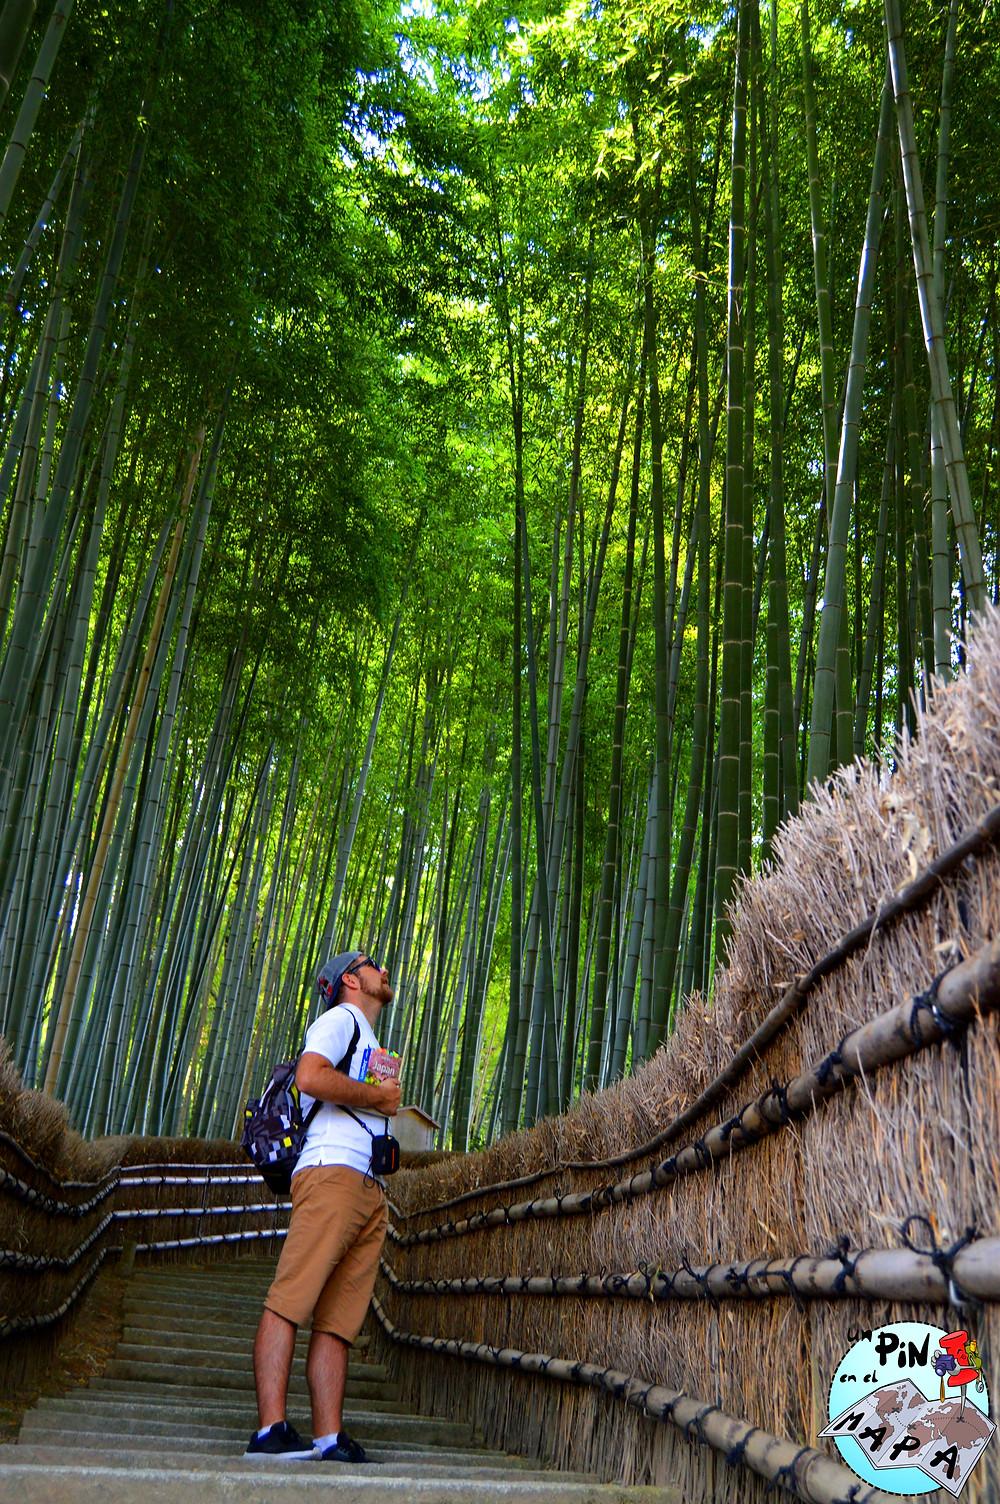 Adashimo Nenbutsu-ji, Arashiyama, Japón | Un Pin en el Mapa